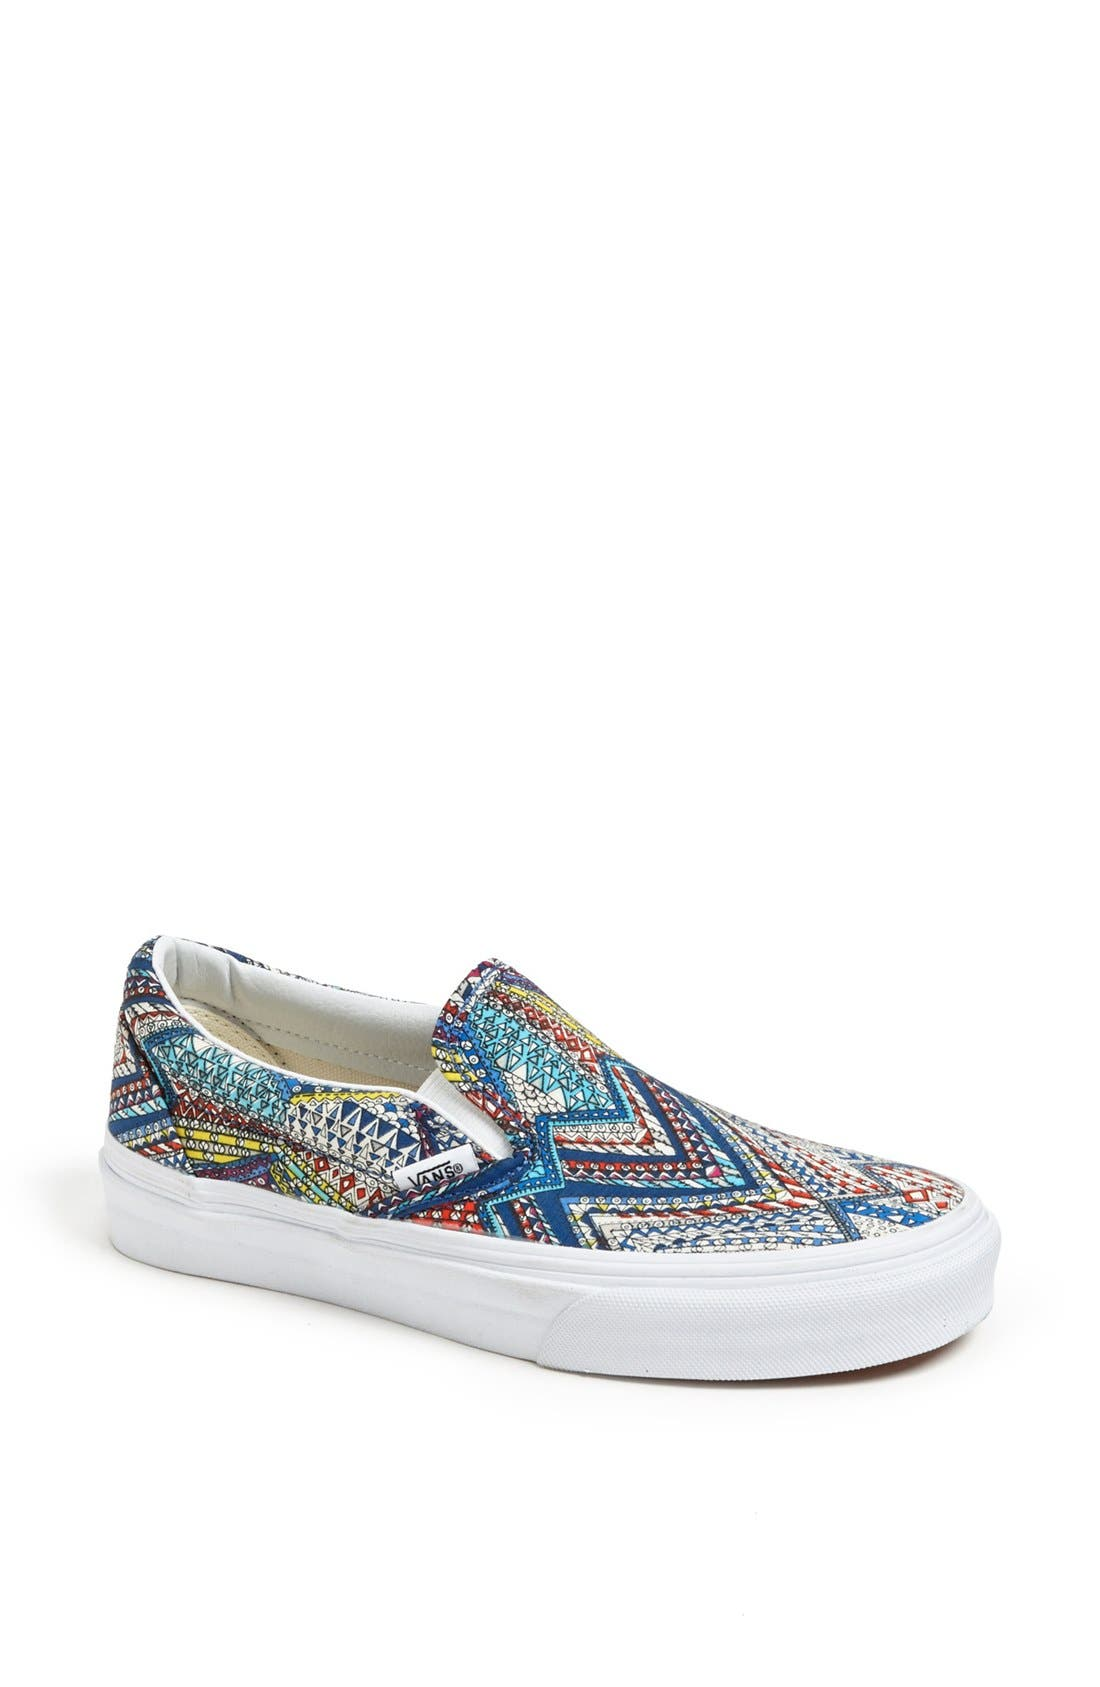 Main Image - Vans 'Classic - Abstract' Sneaker (Women)